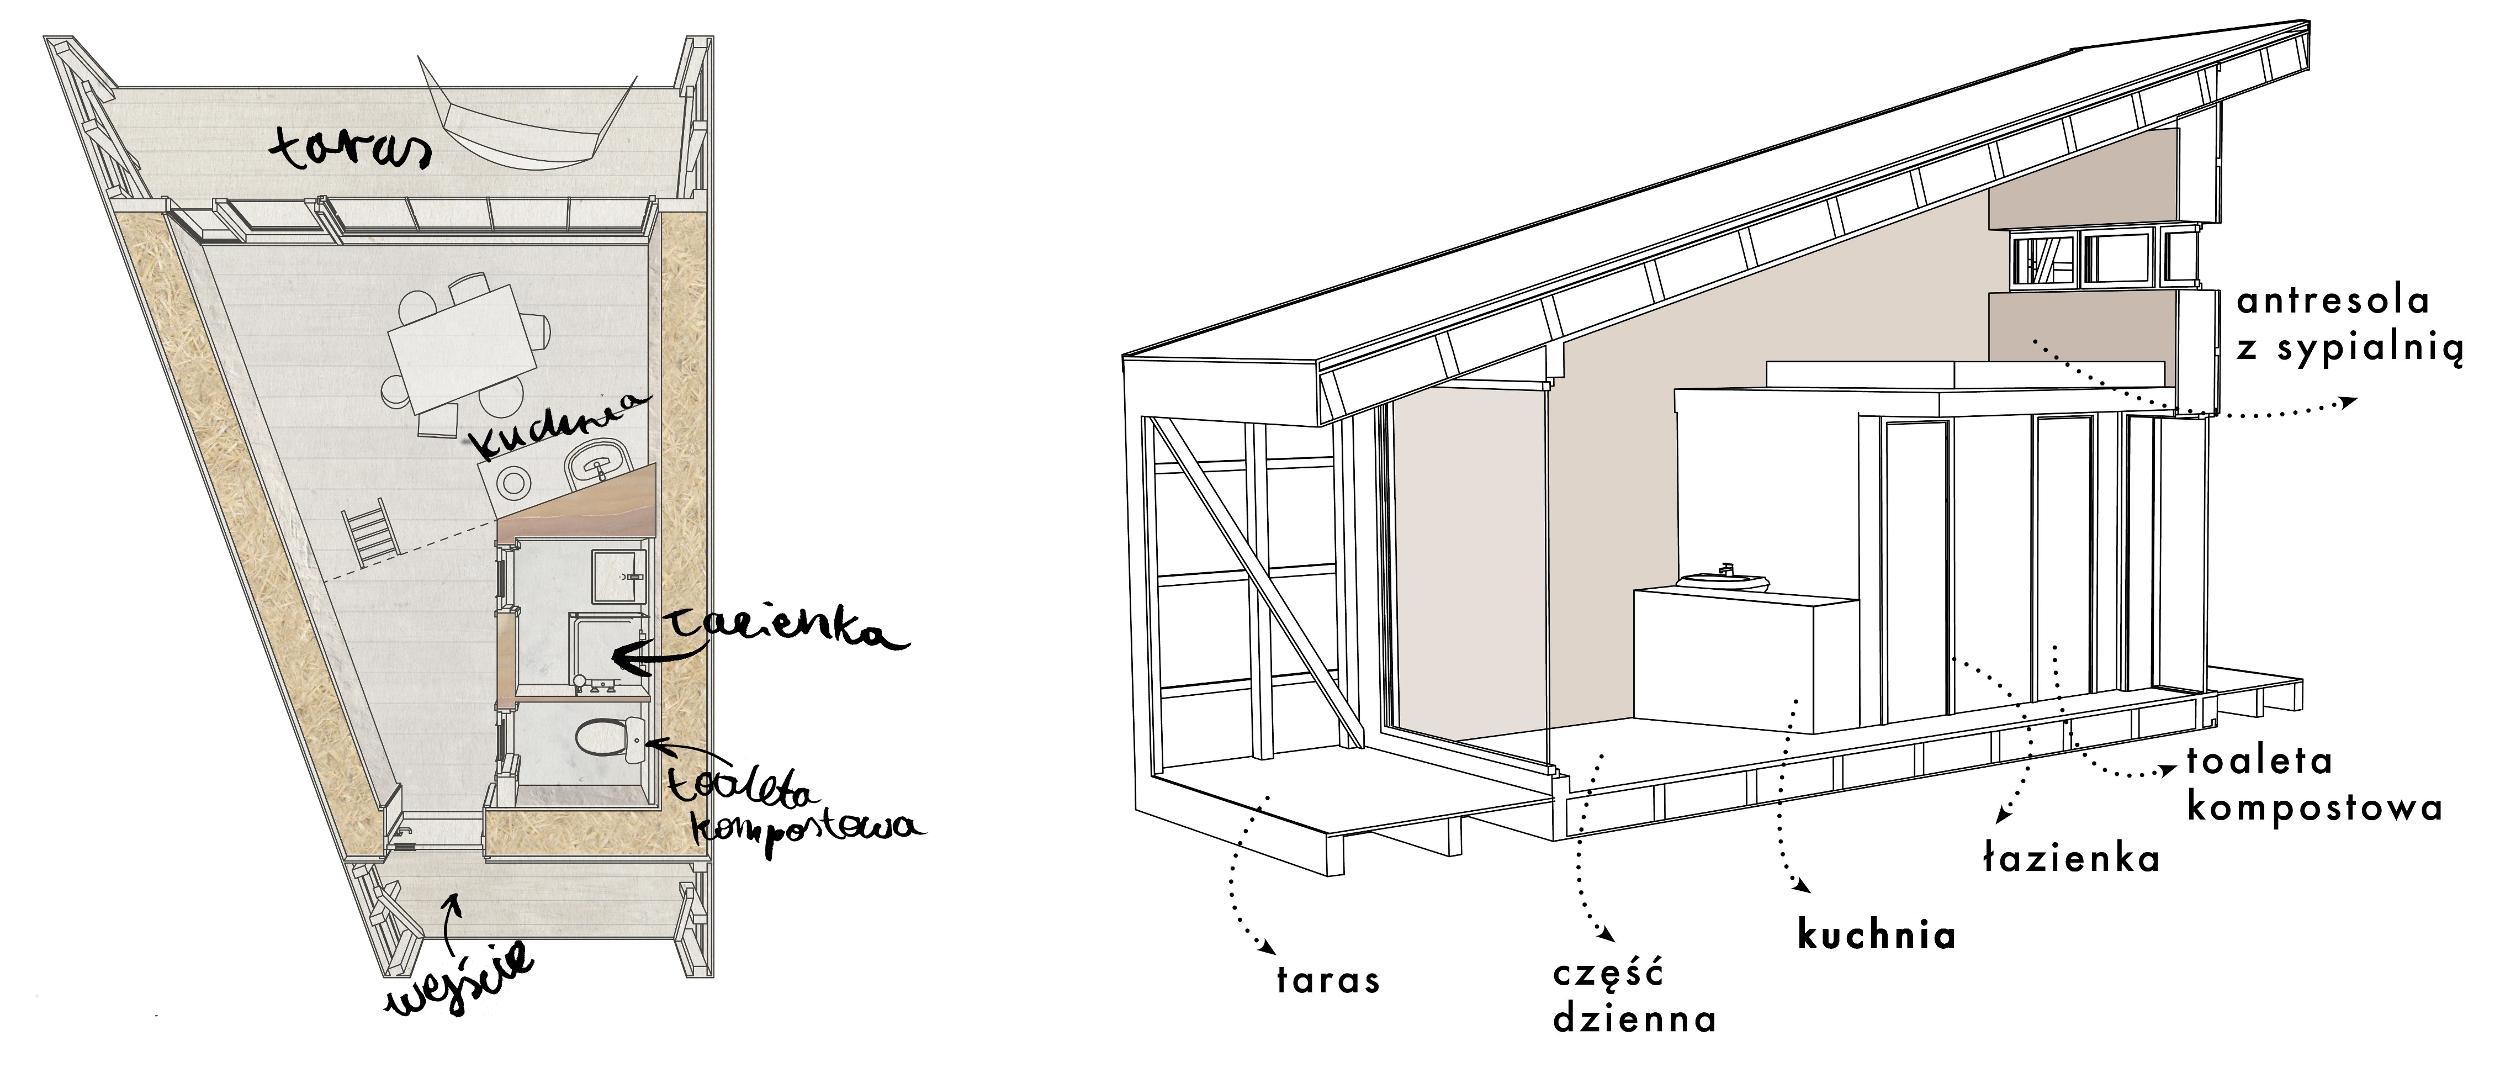 Projekt domu (fot. materiały prasowe)